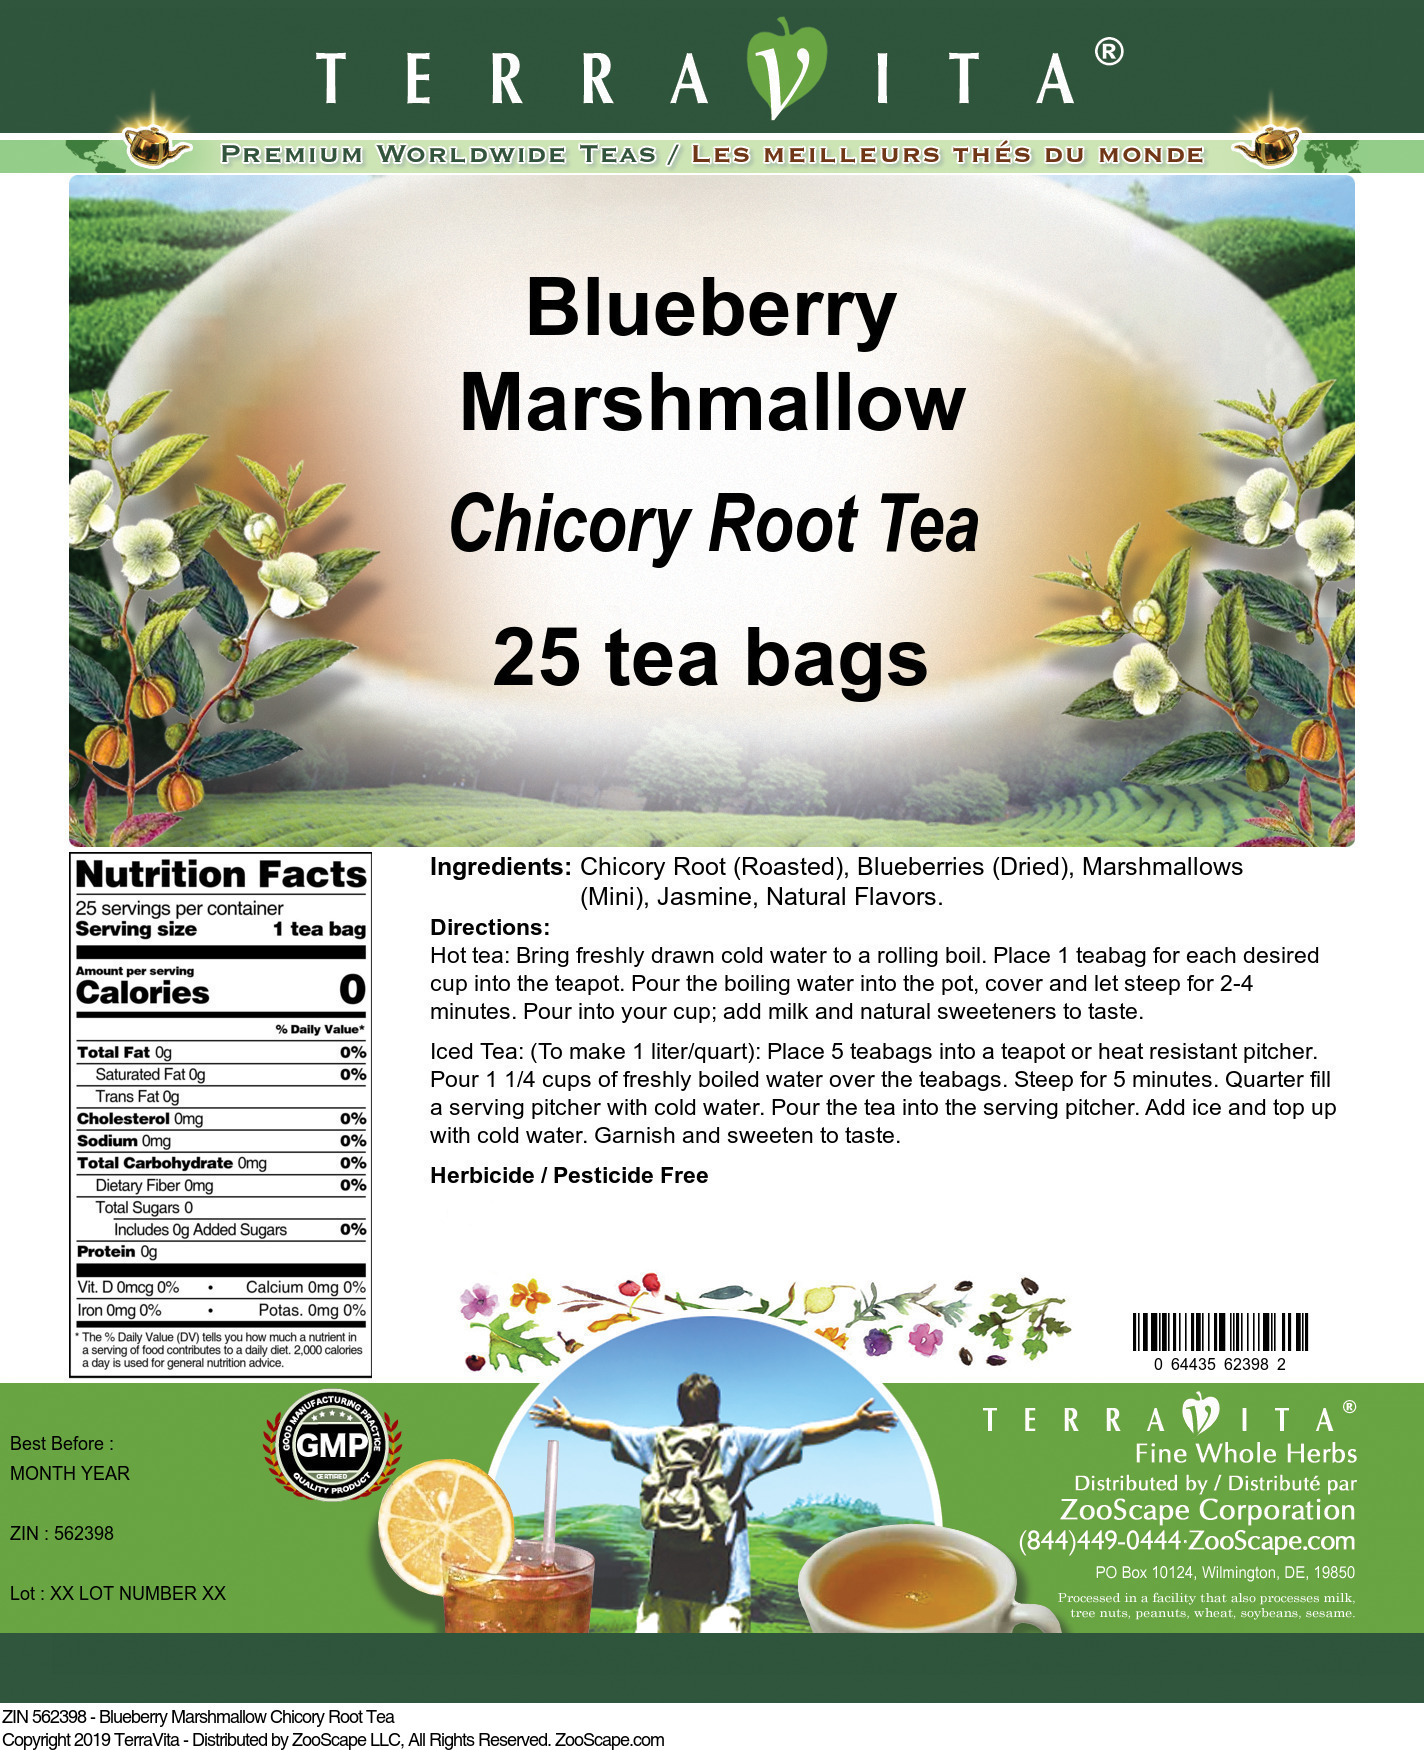 Blueberry Marshmallow Chicory Root Tea